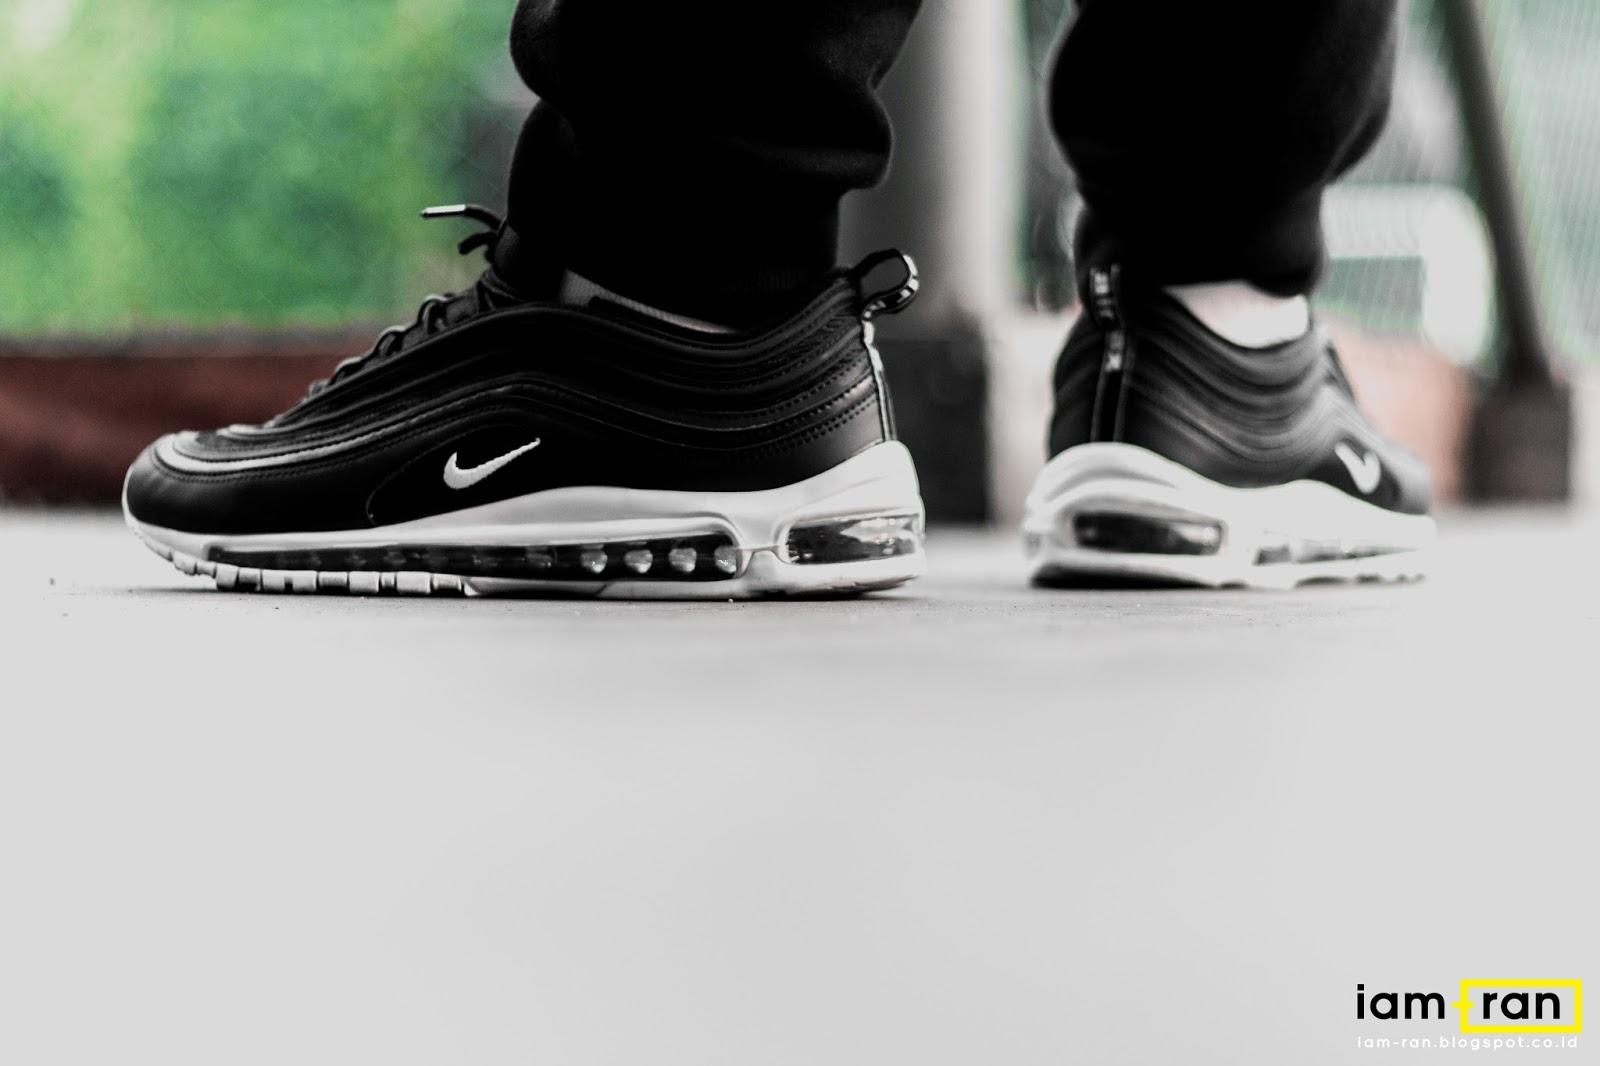 IAM RAN: ON FEET : Zulfikar Ali Nike air max 97 Black and